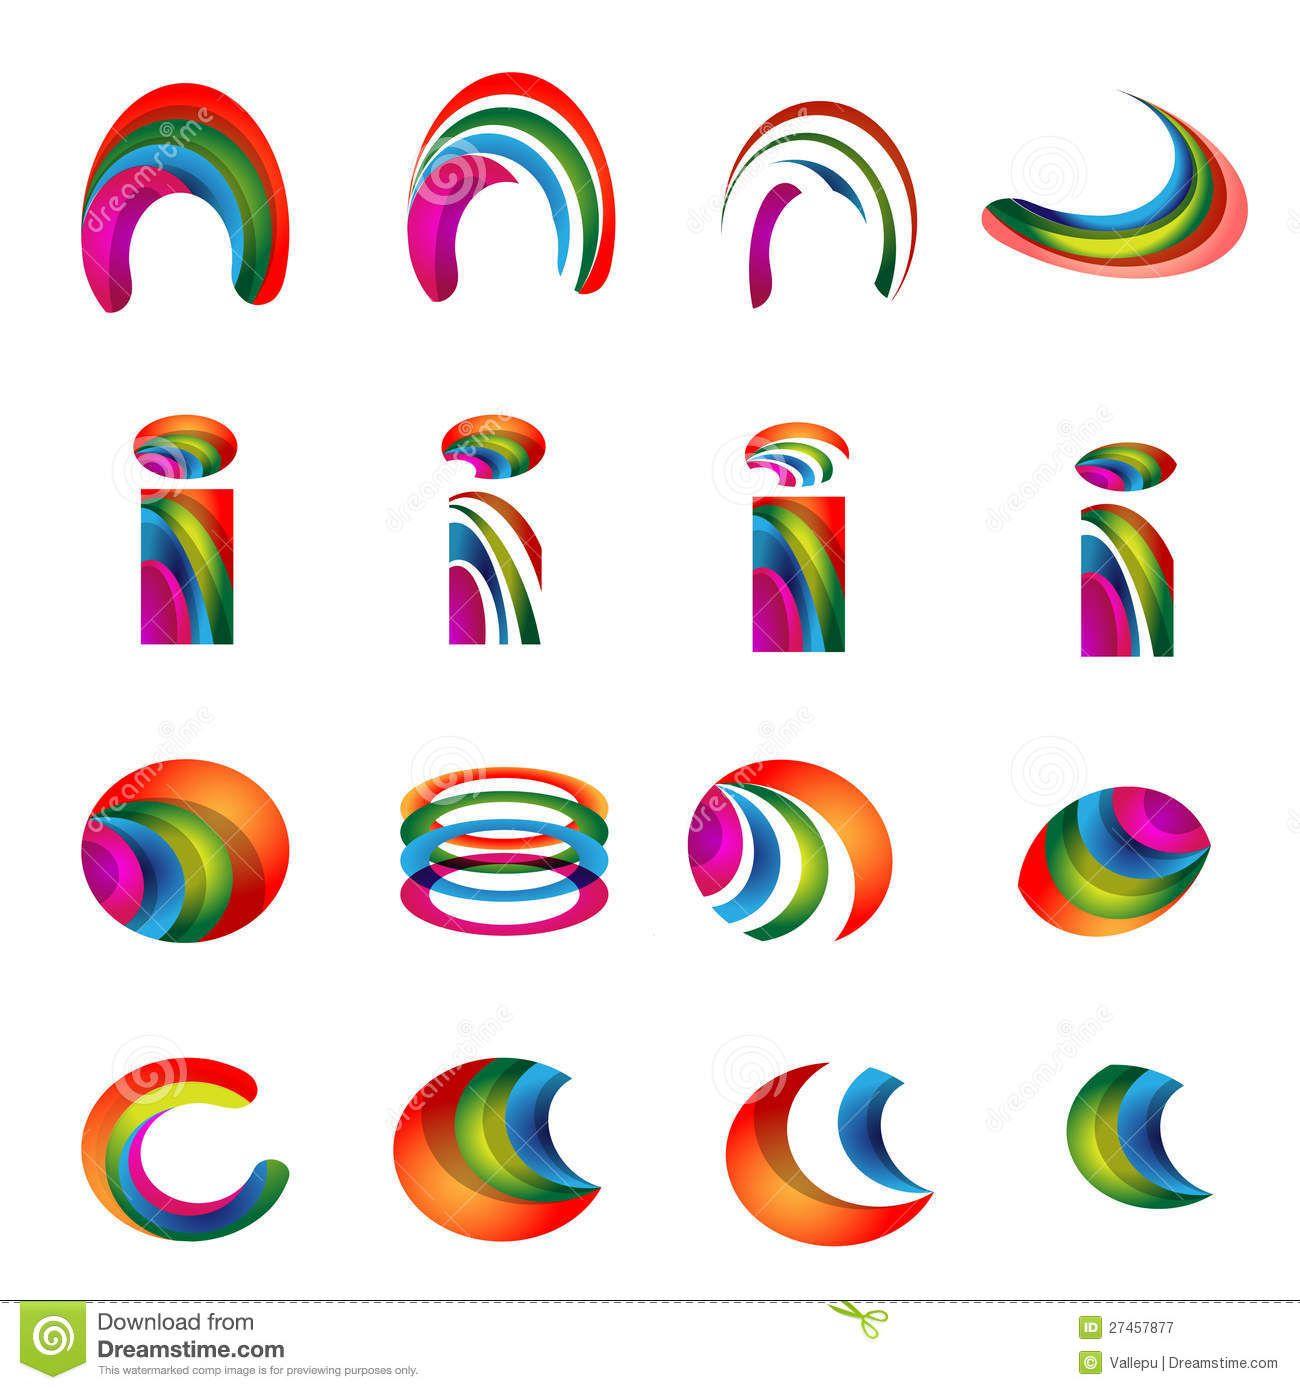 Vector Alphabet Vibrant Logo Designs Version 2 Royalty Free Stock ... for Logo Design For Alphabets  55jwn